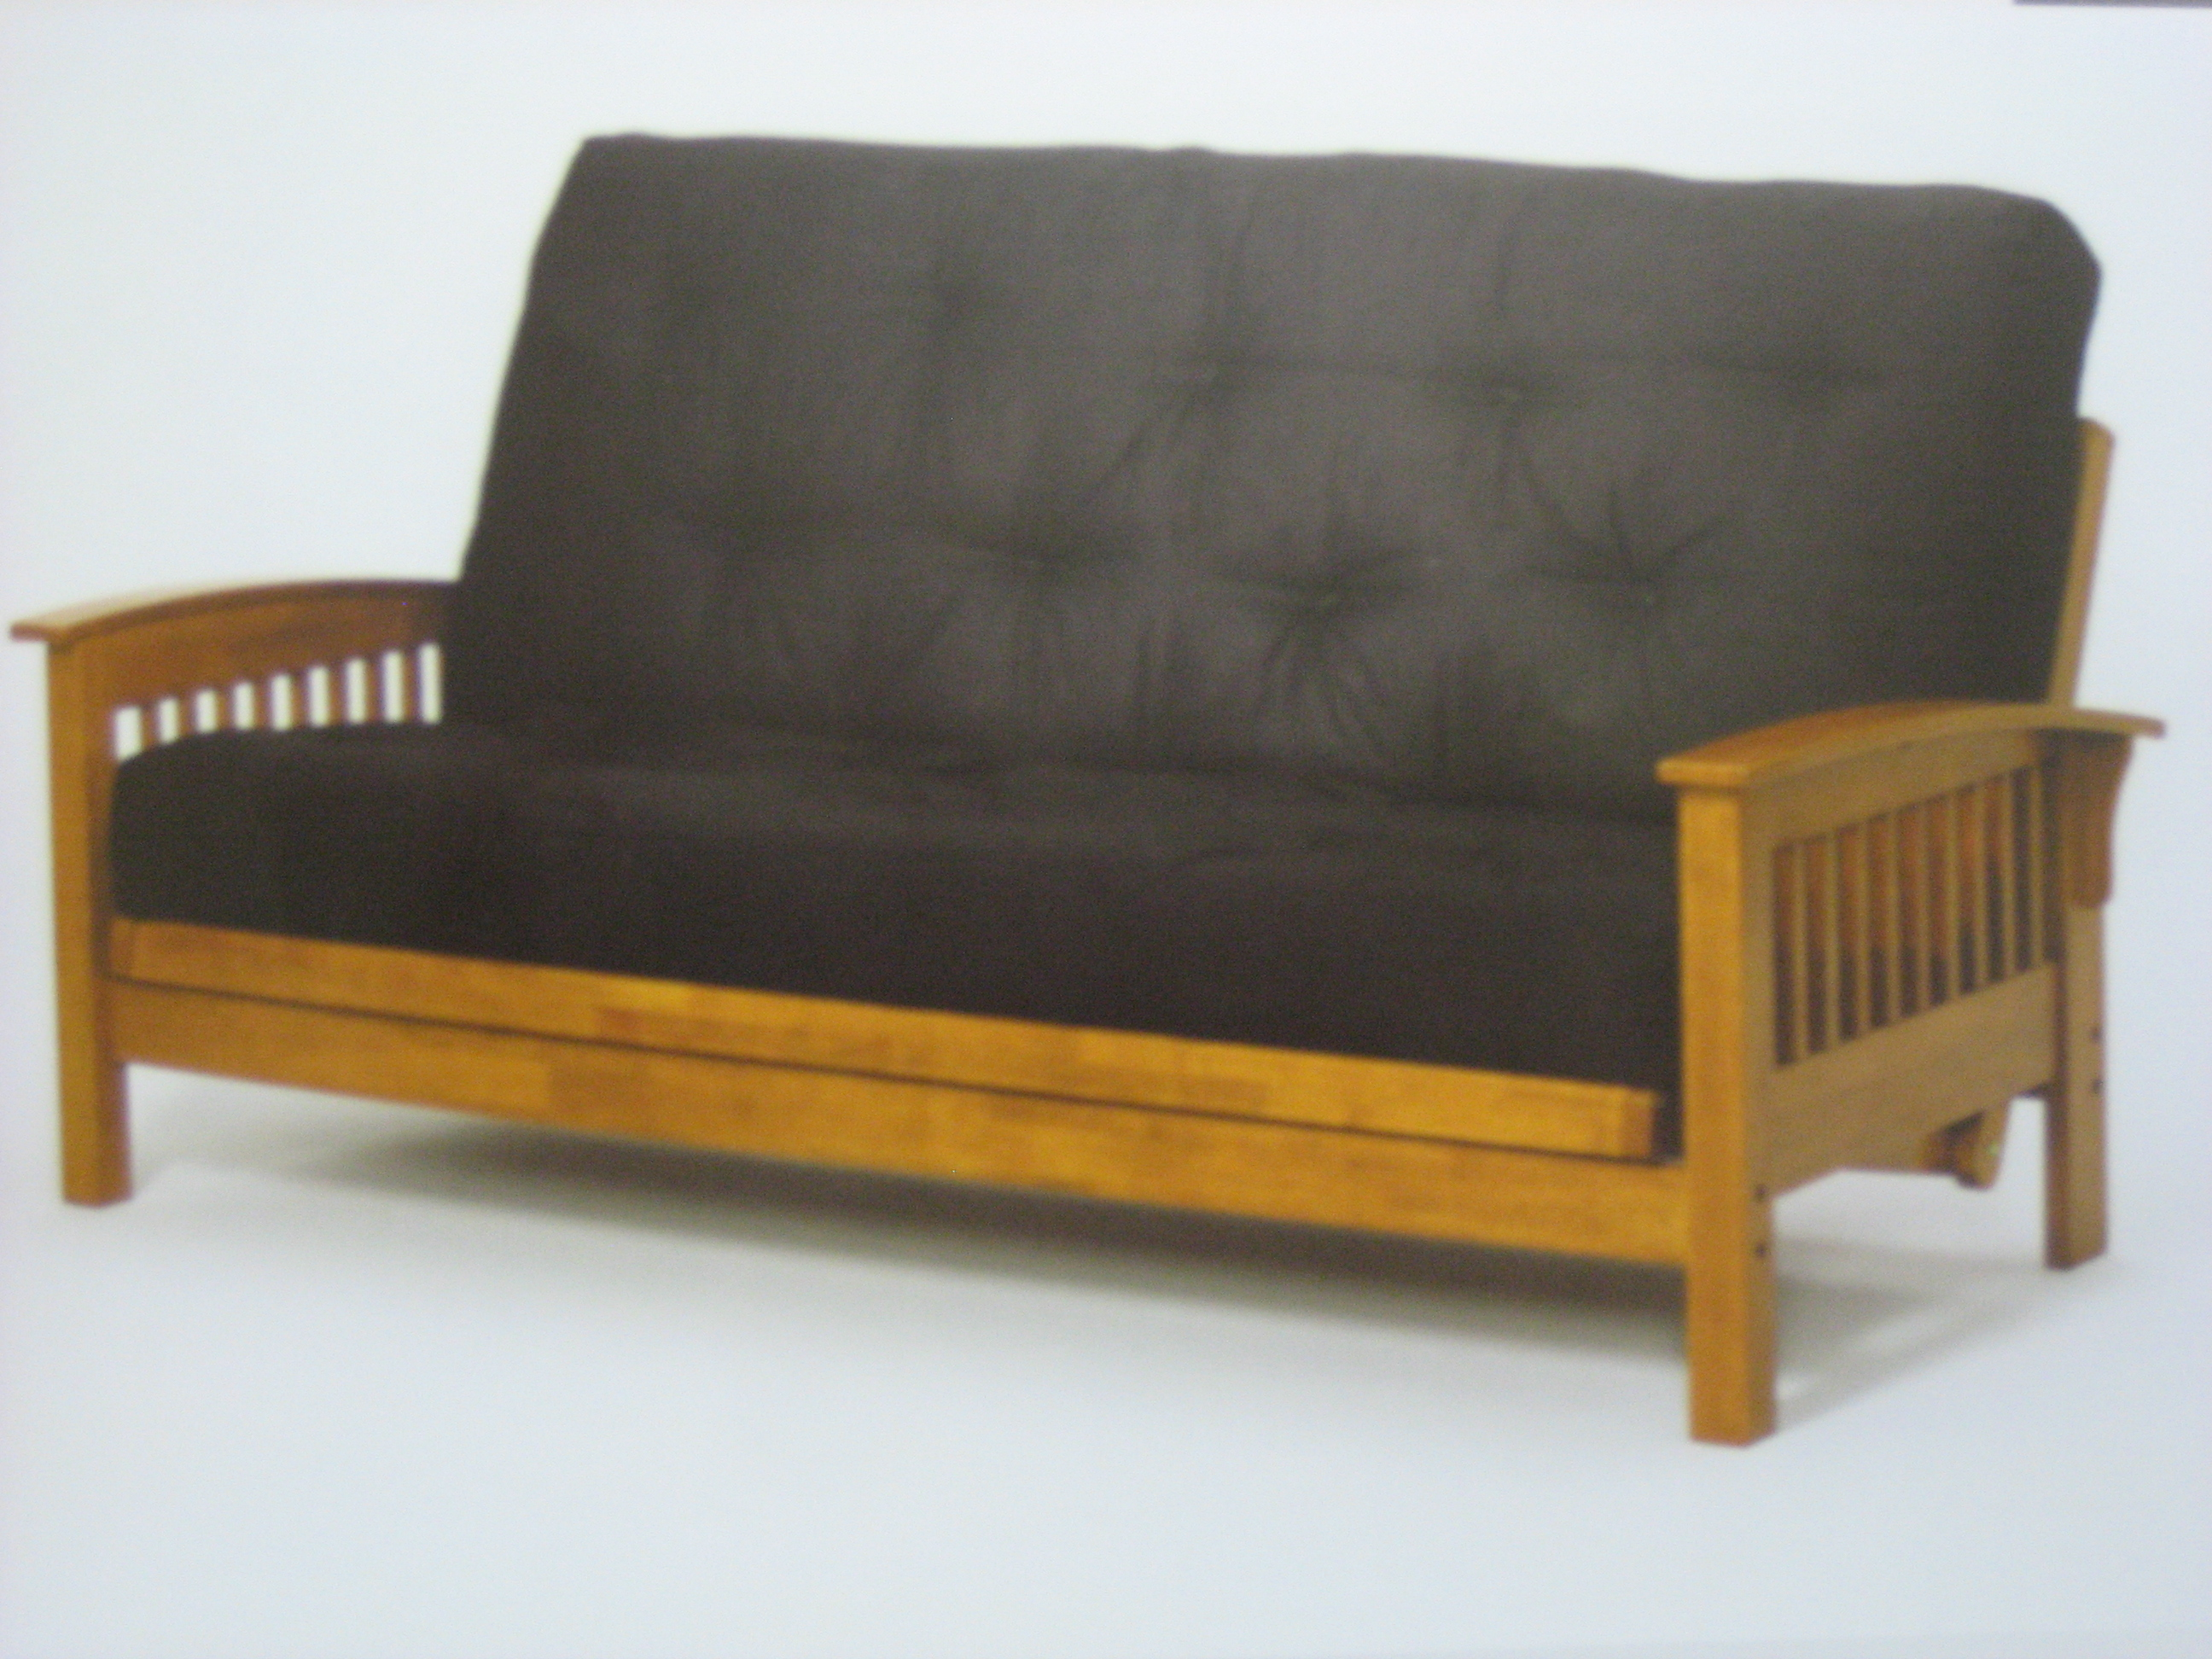 wooden futon chairs ergonomic chair reddit 4487 frame 4485mb black mattress